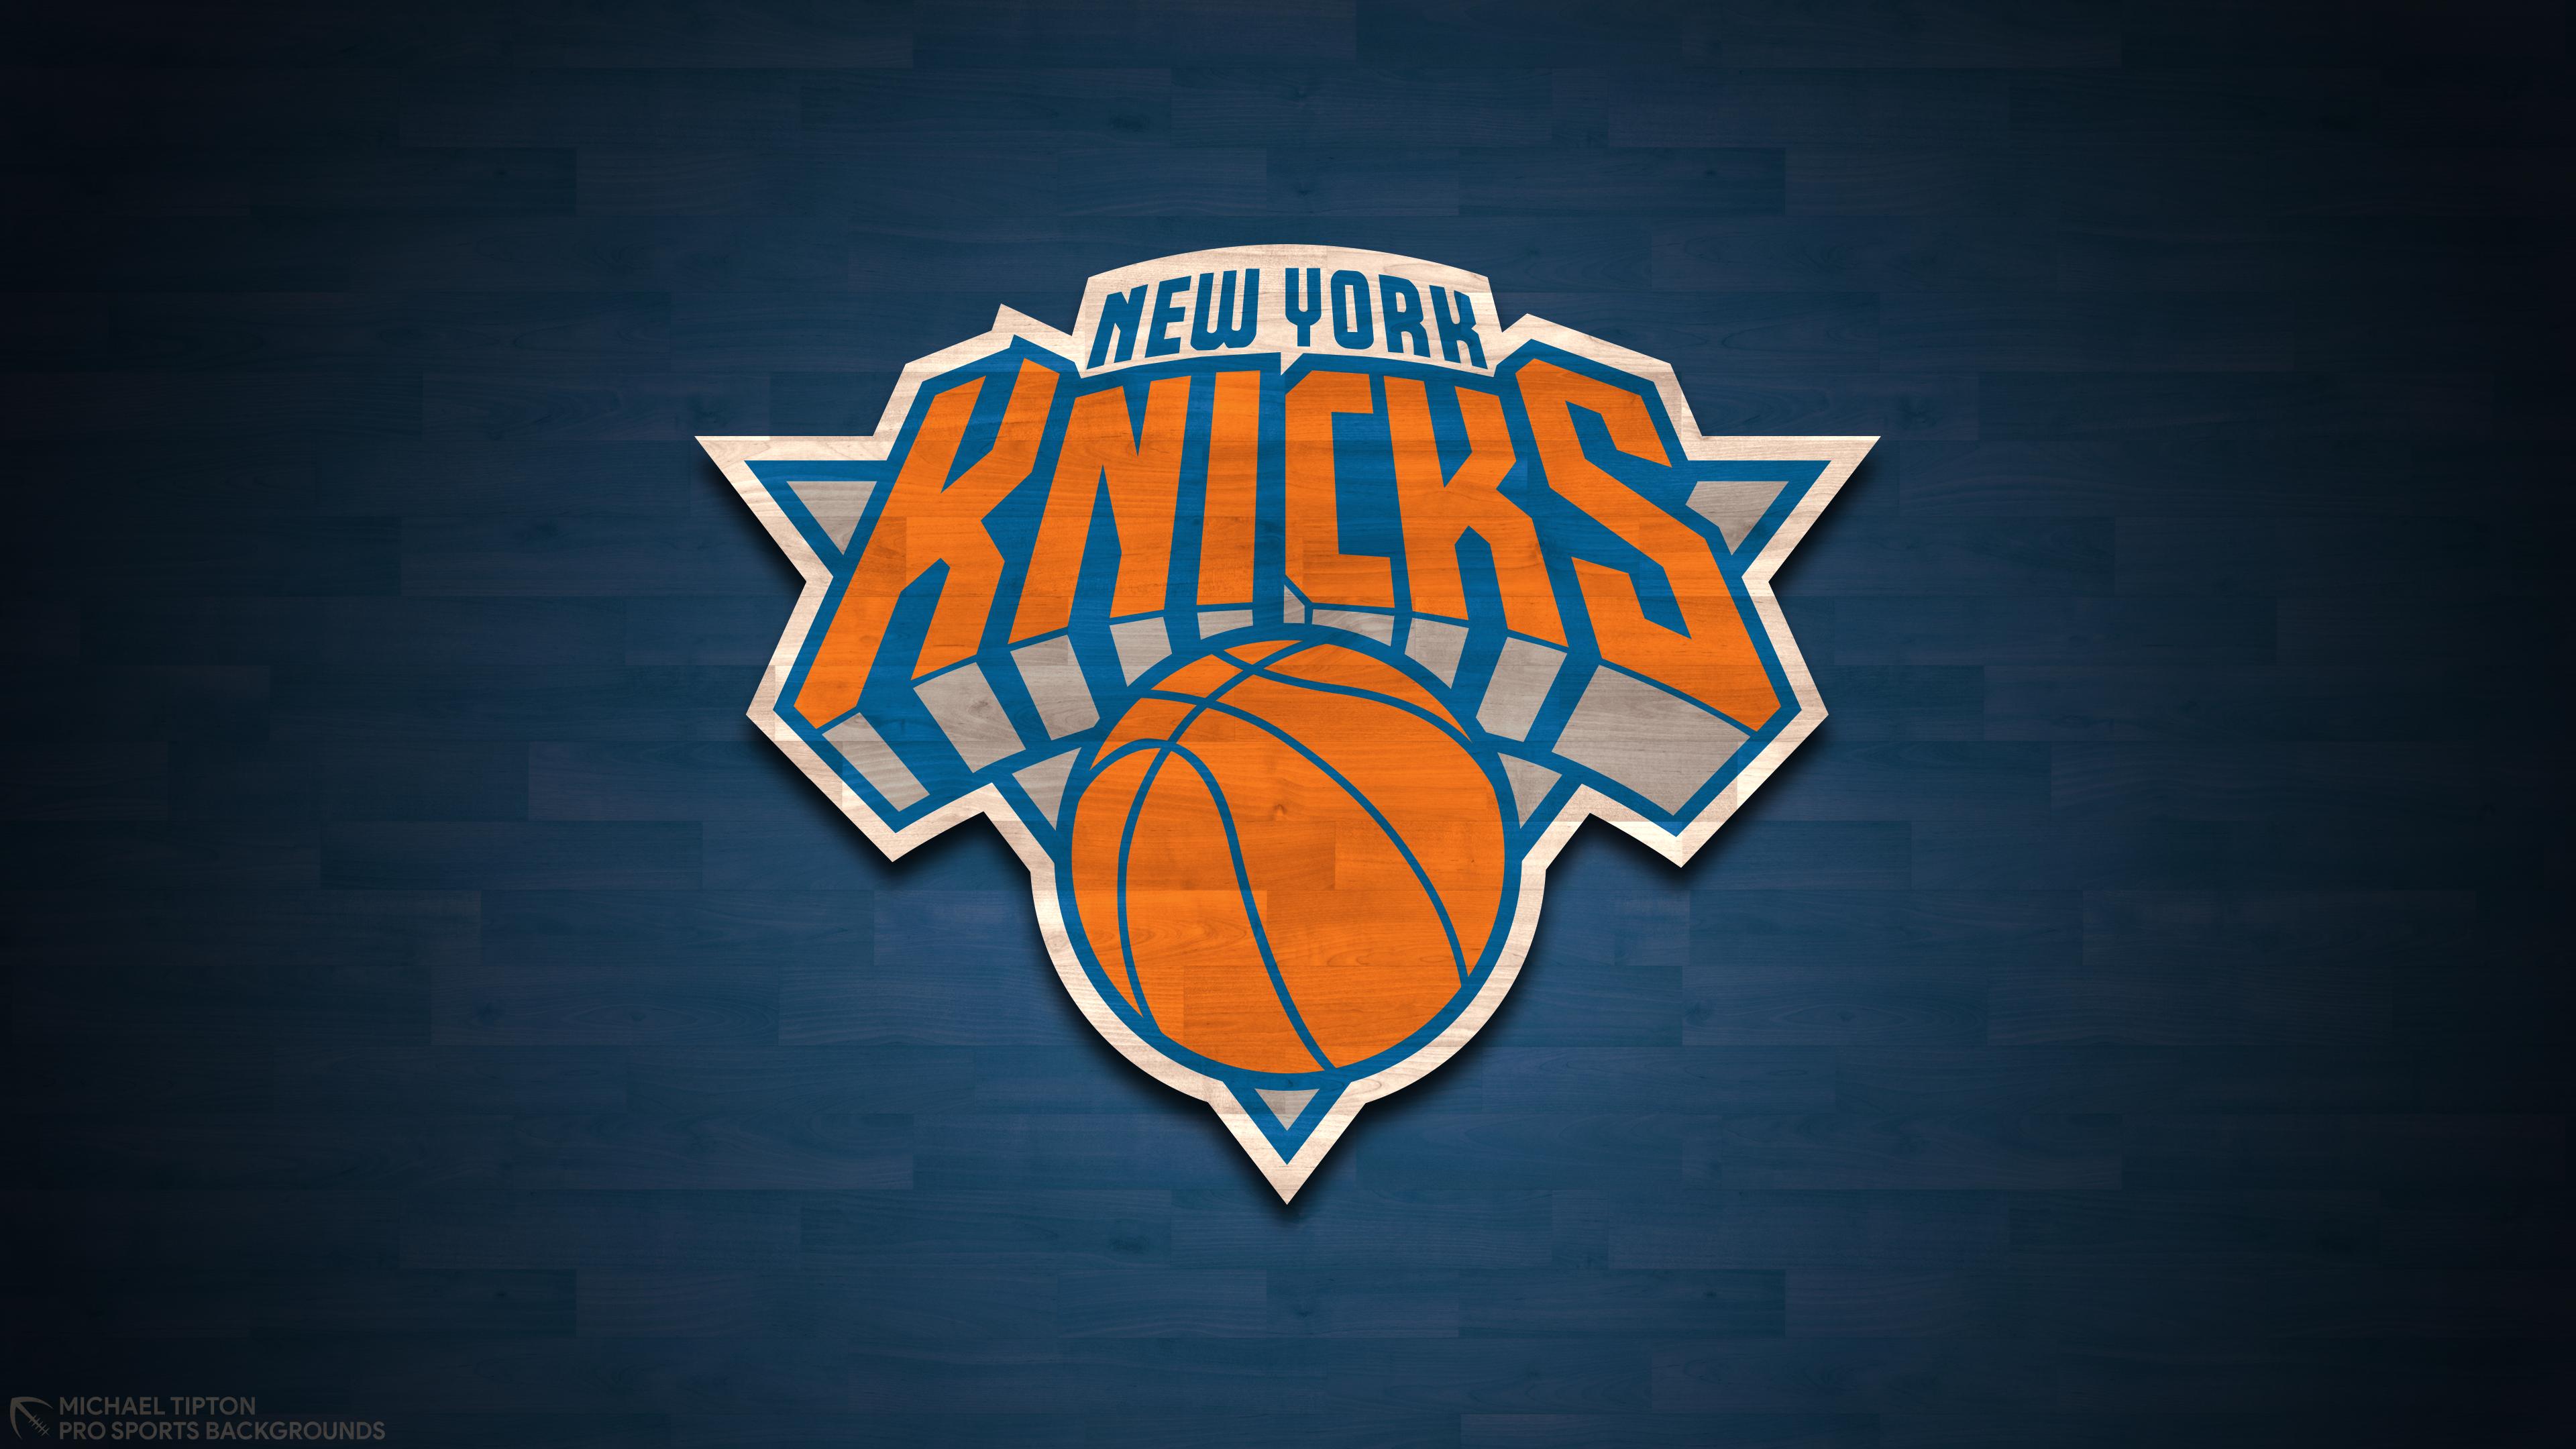 New York Knicks 4k Ultra Fondo de